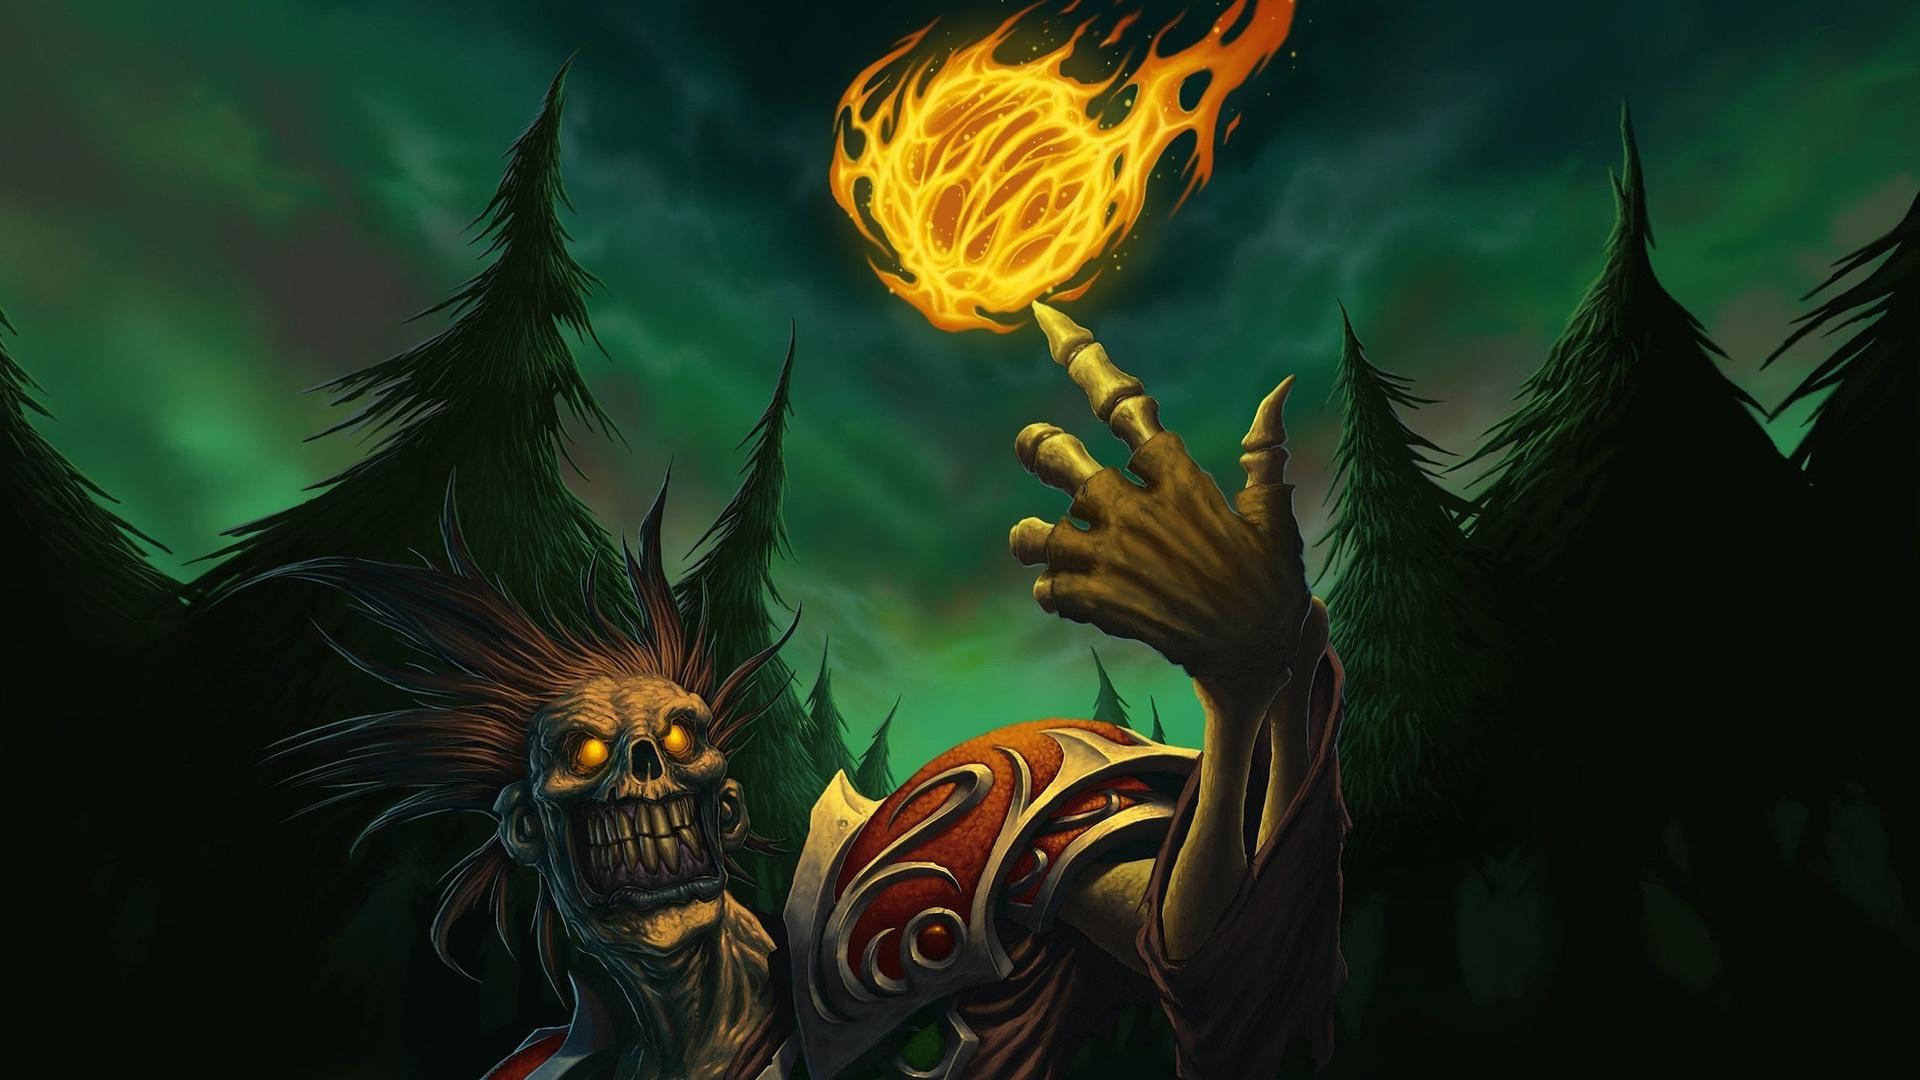 World Of Warcraft Fan Art Hd Desktop Wallpaper High